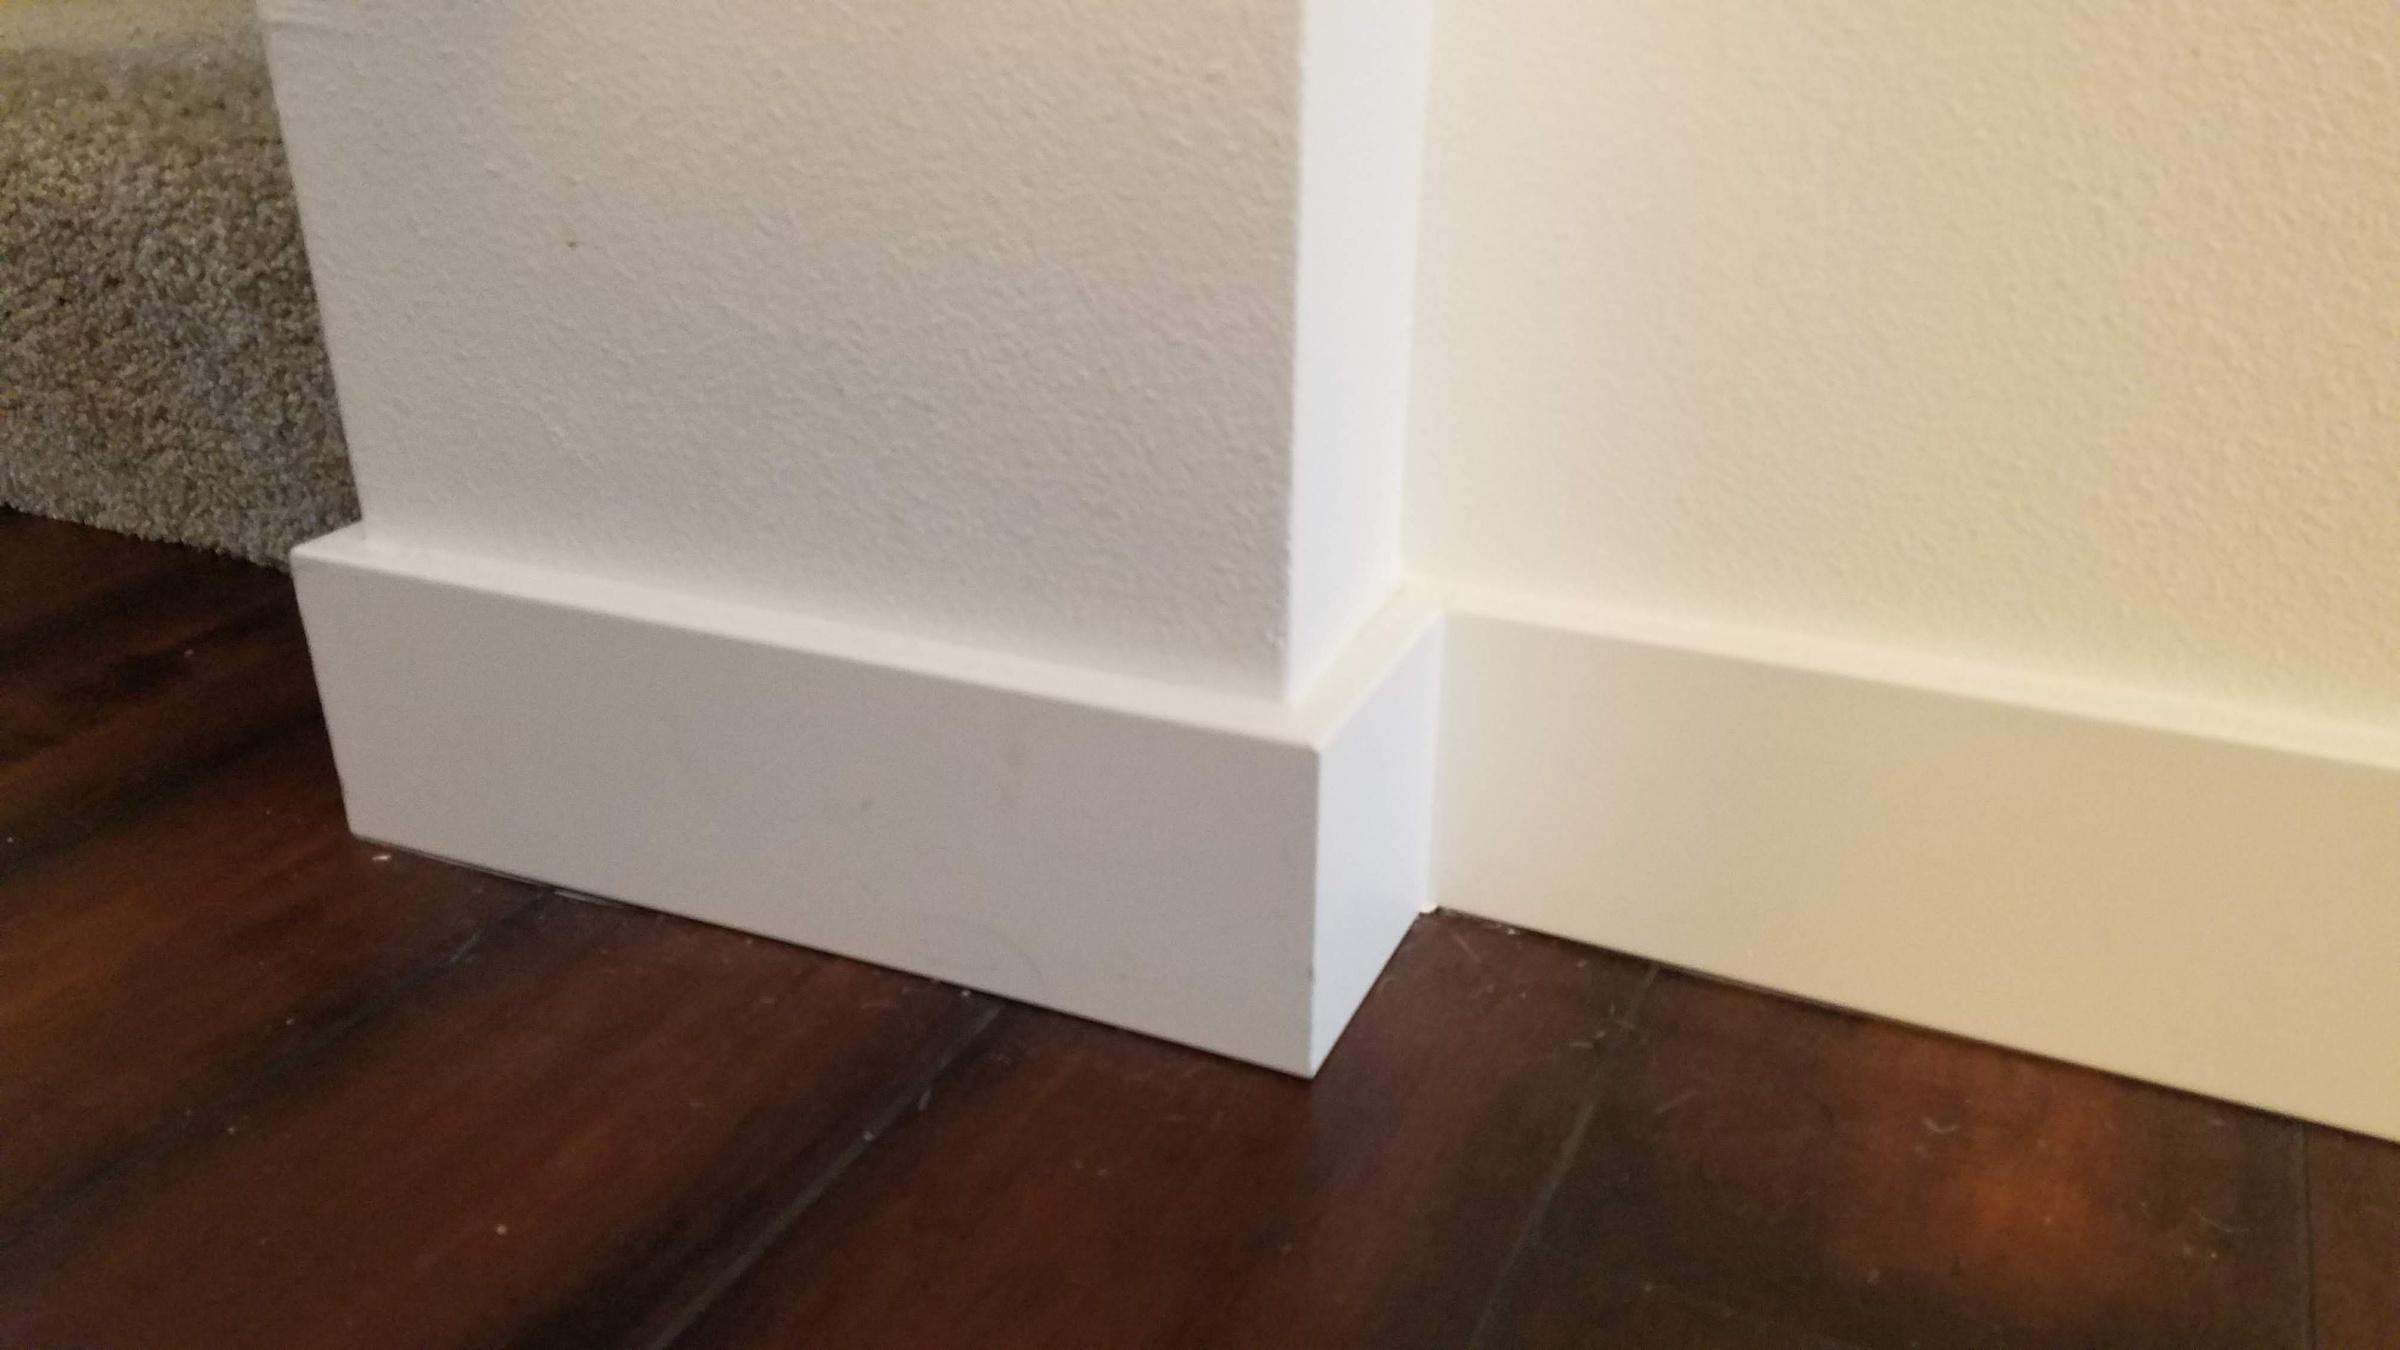 Base Molding Mdf Or Wood Cut